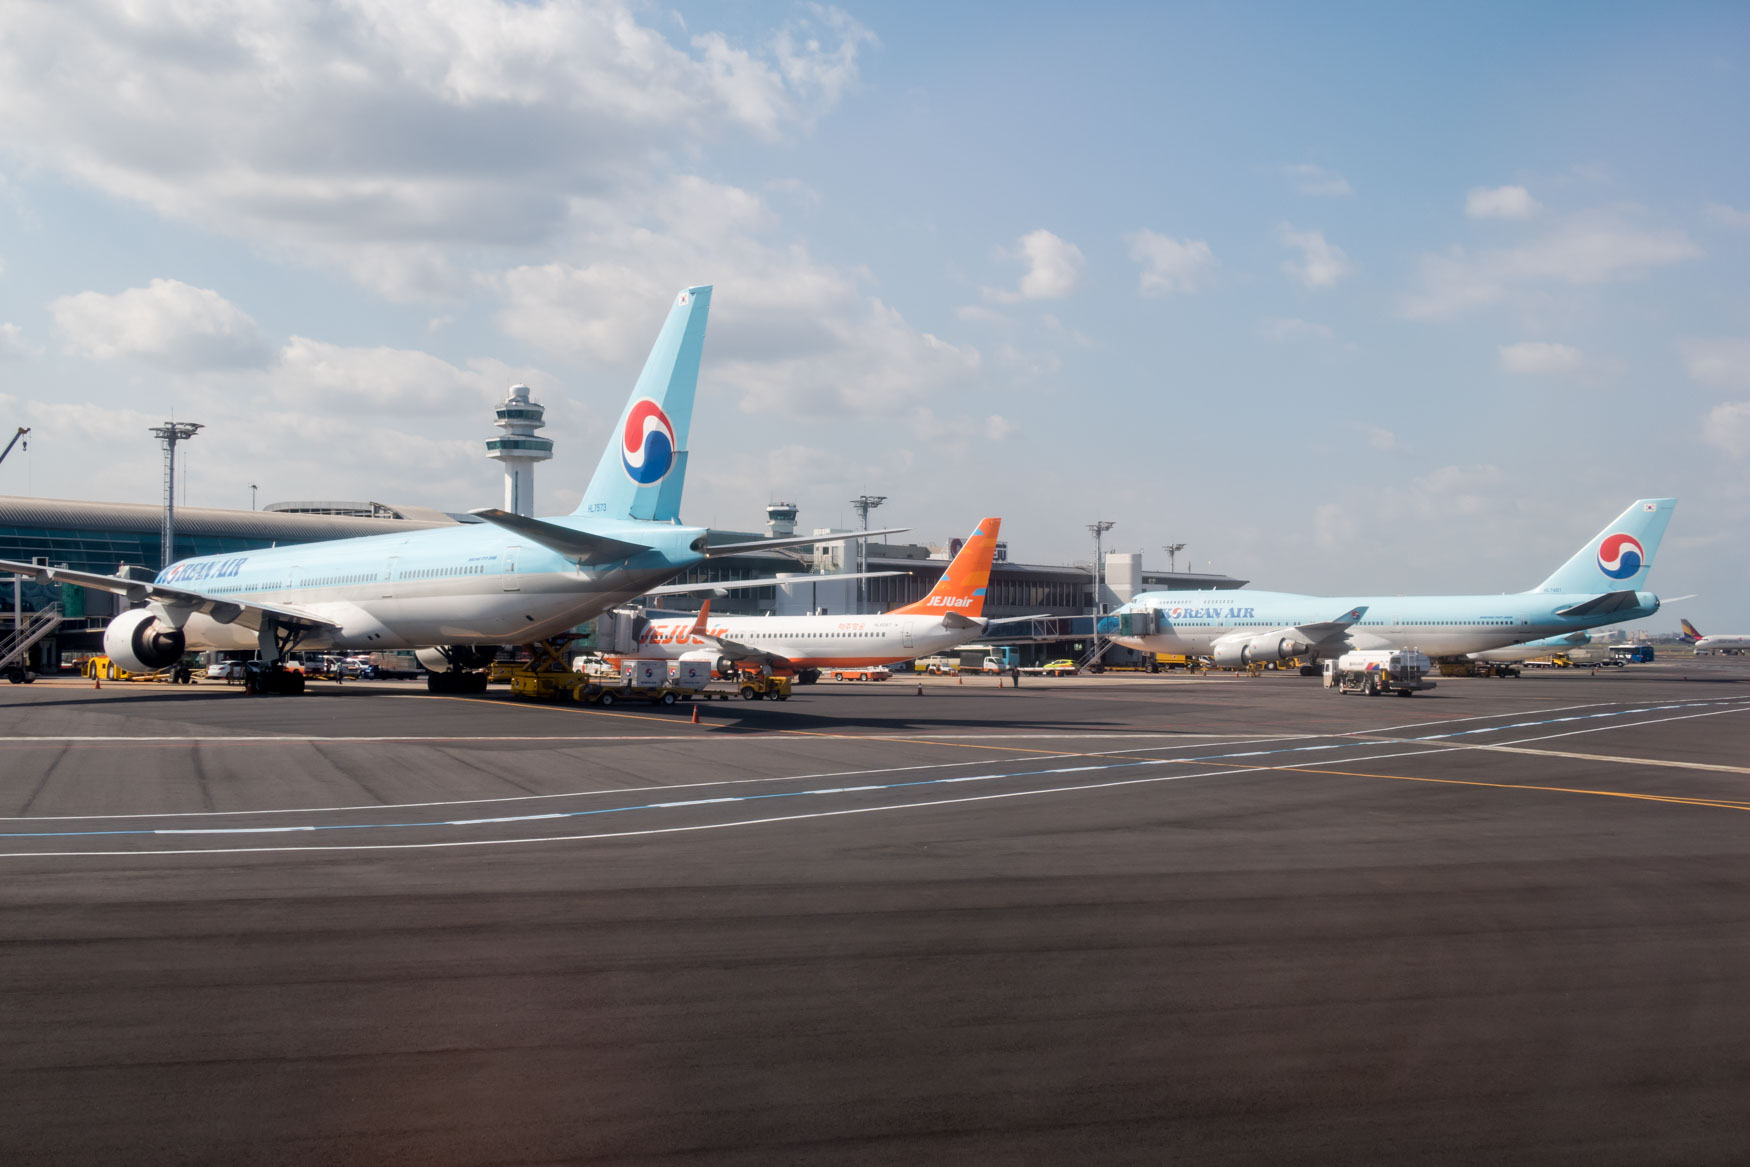 Flight Review: Jeju Air 737-800 Economy Class from Jeju to Busan